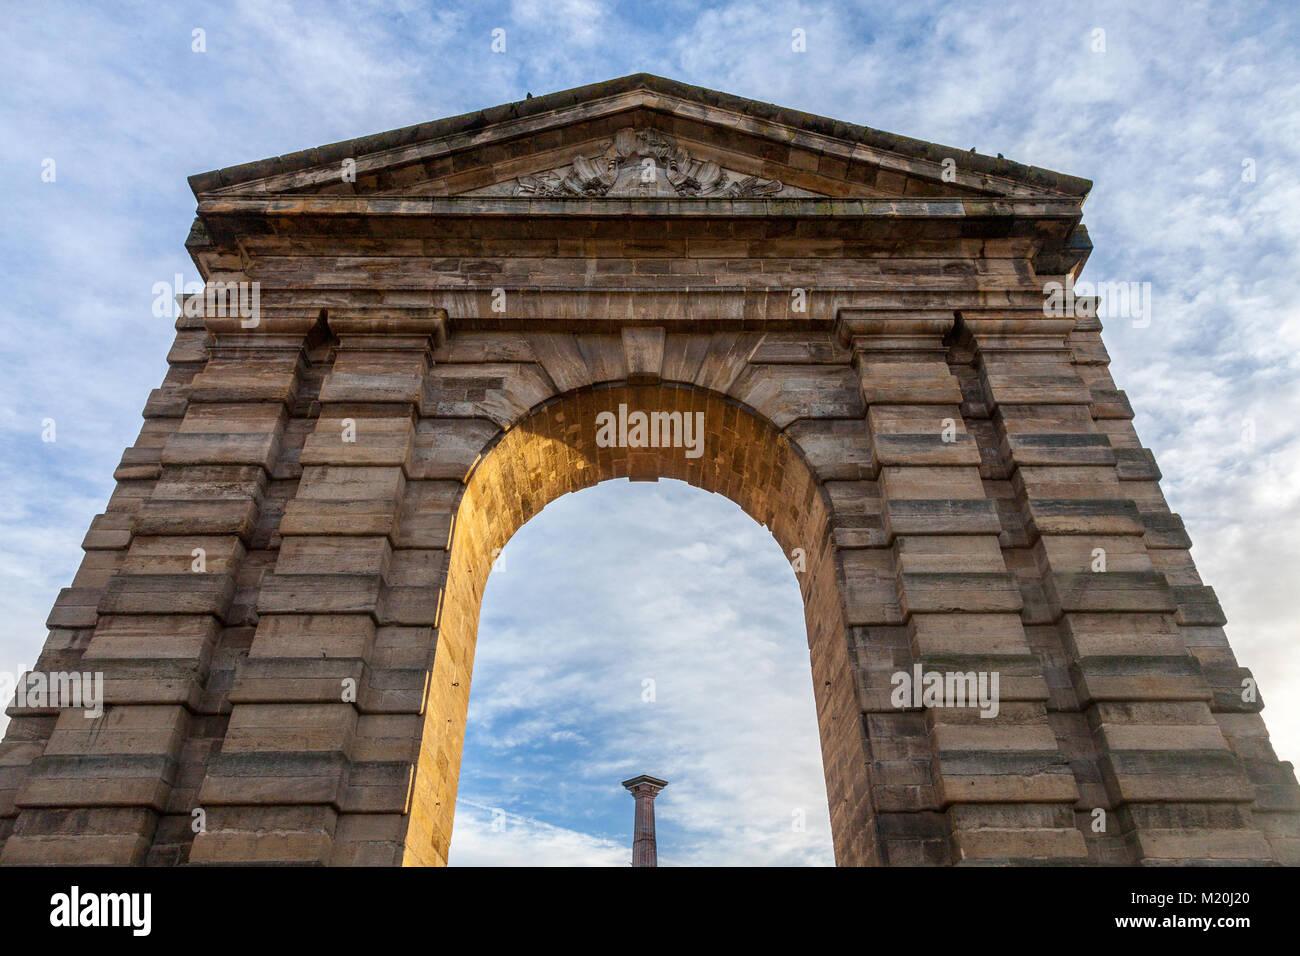 Porte d'Aquitaine (Aquitaine Gate) with its symbolic arch and column on Place de la Victoire Square in Bordeaux, - Stock Image